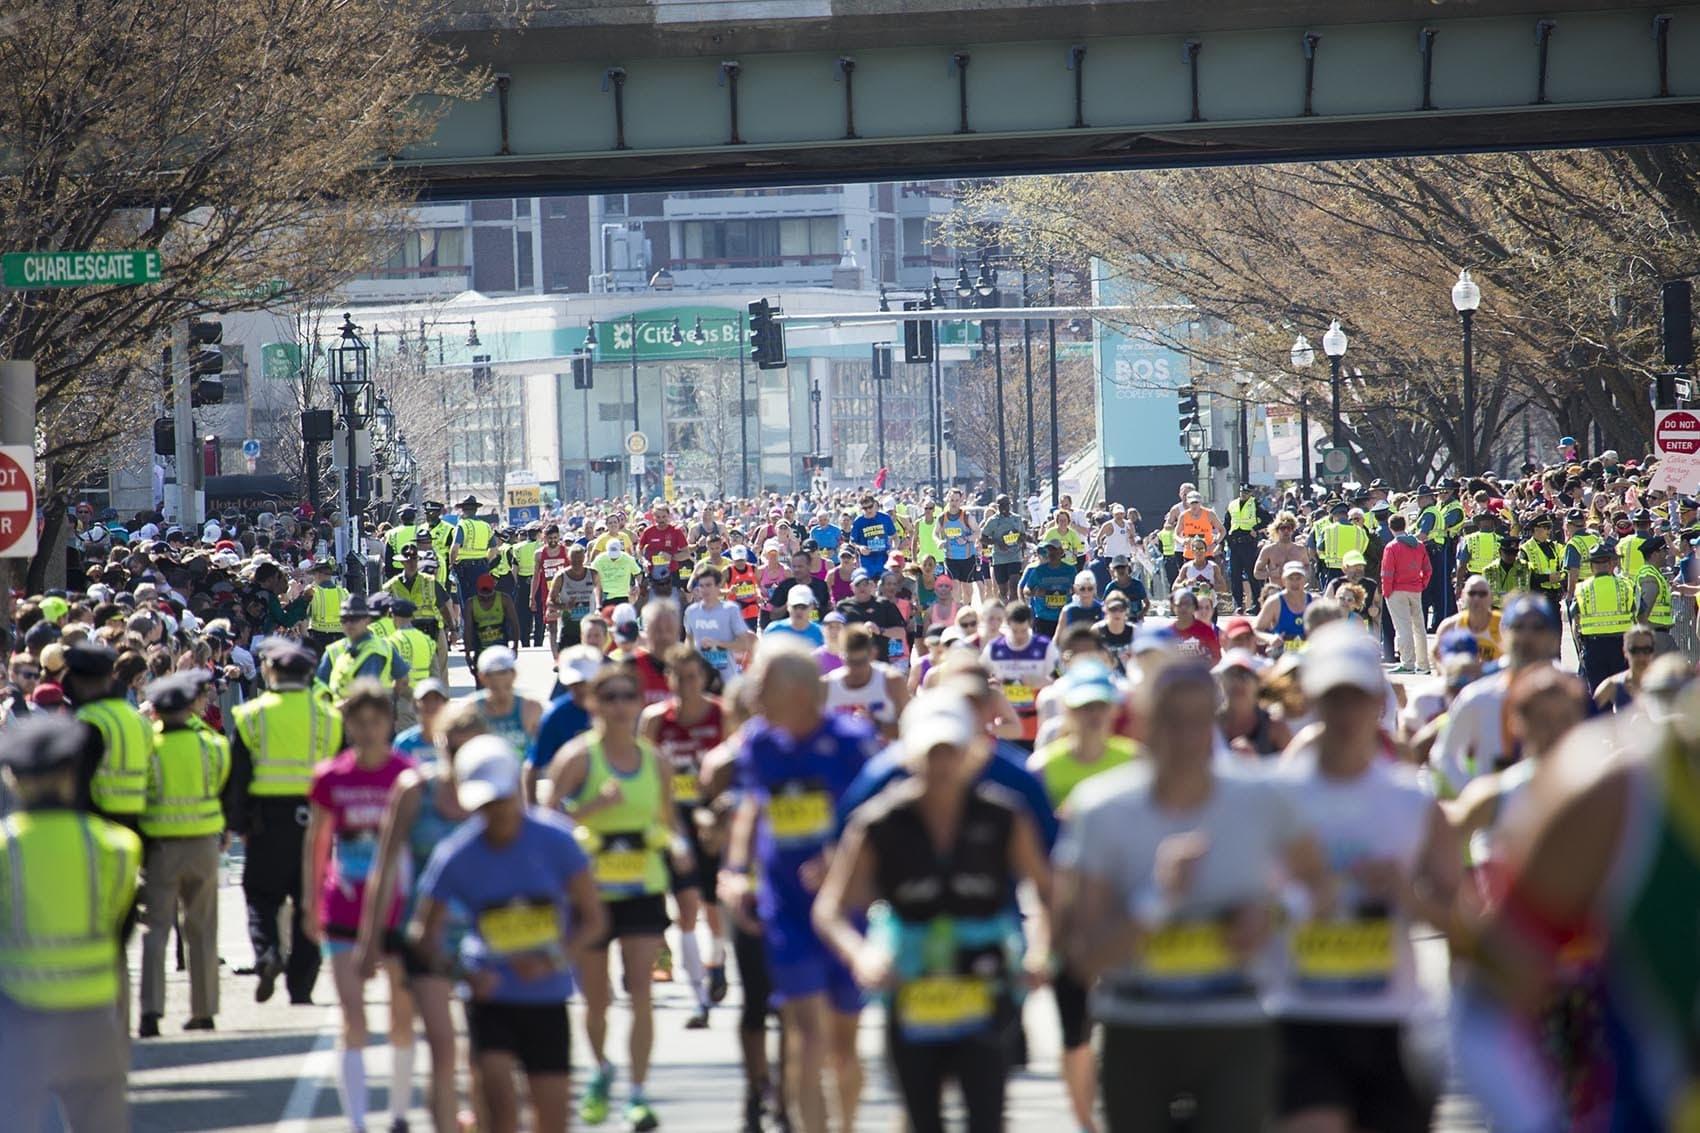 Hundreds of runners pour through Kenmore Square at the 2016 Boston Marathon. (Jesse Costa/WBUR)